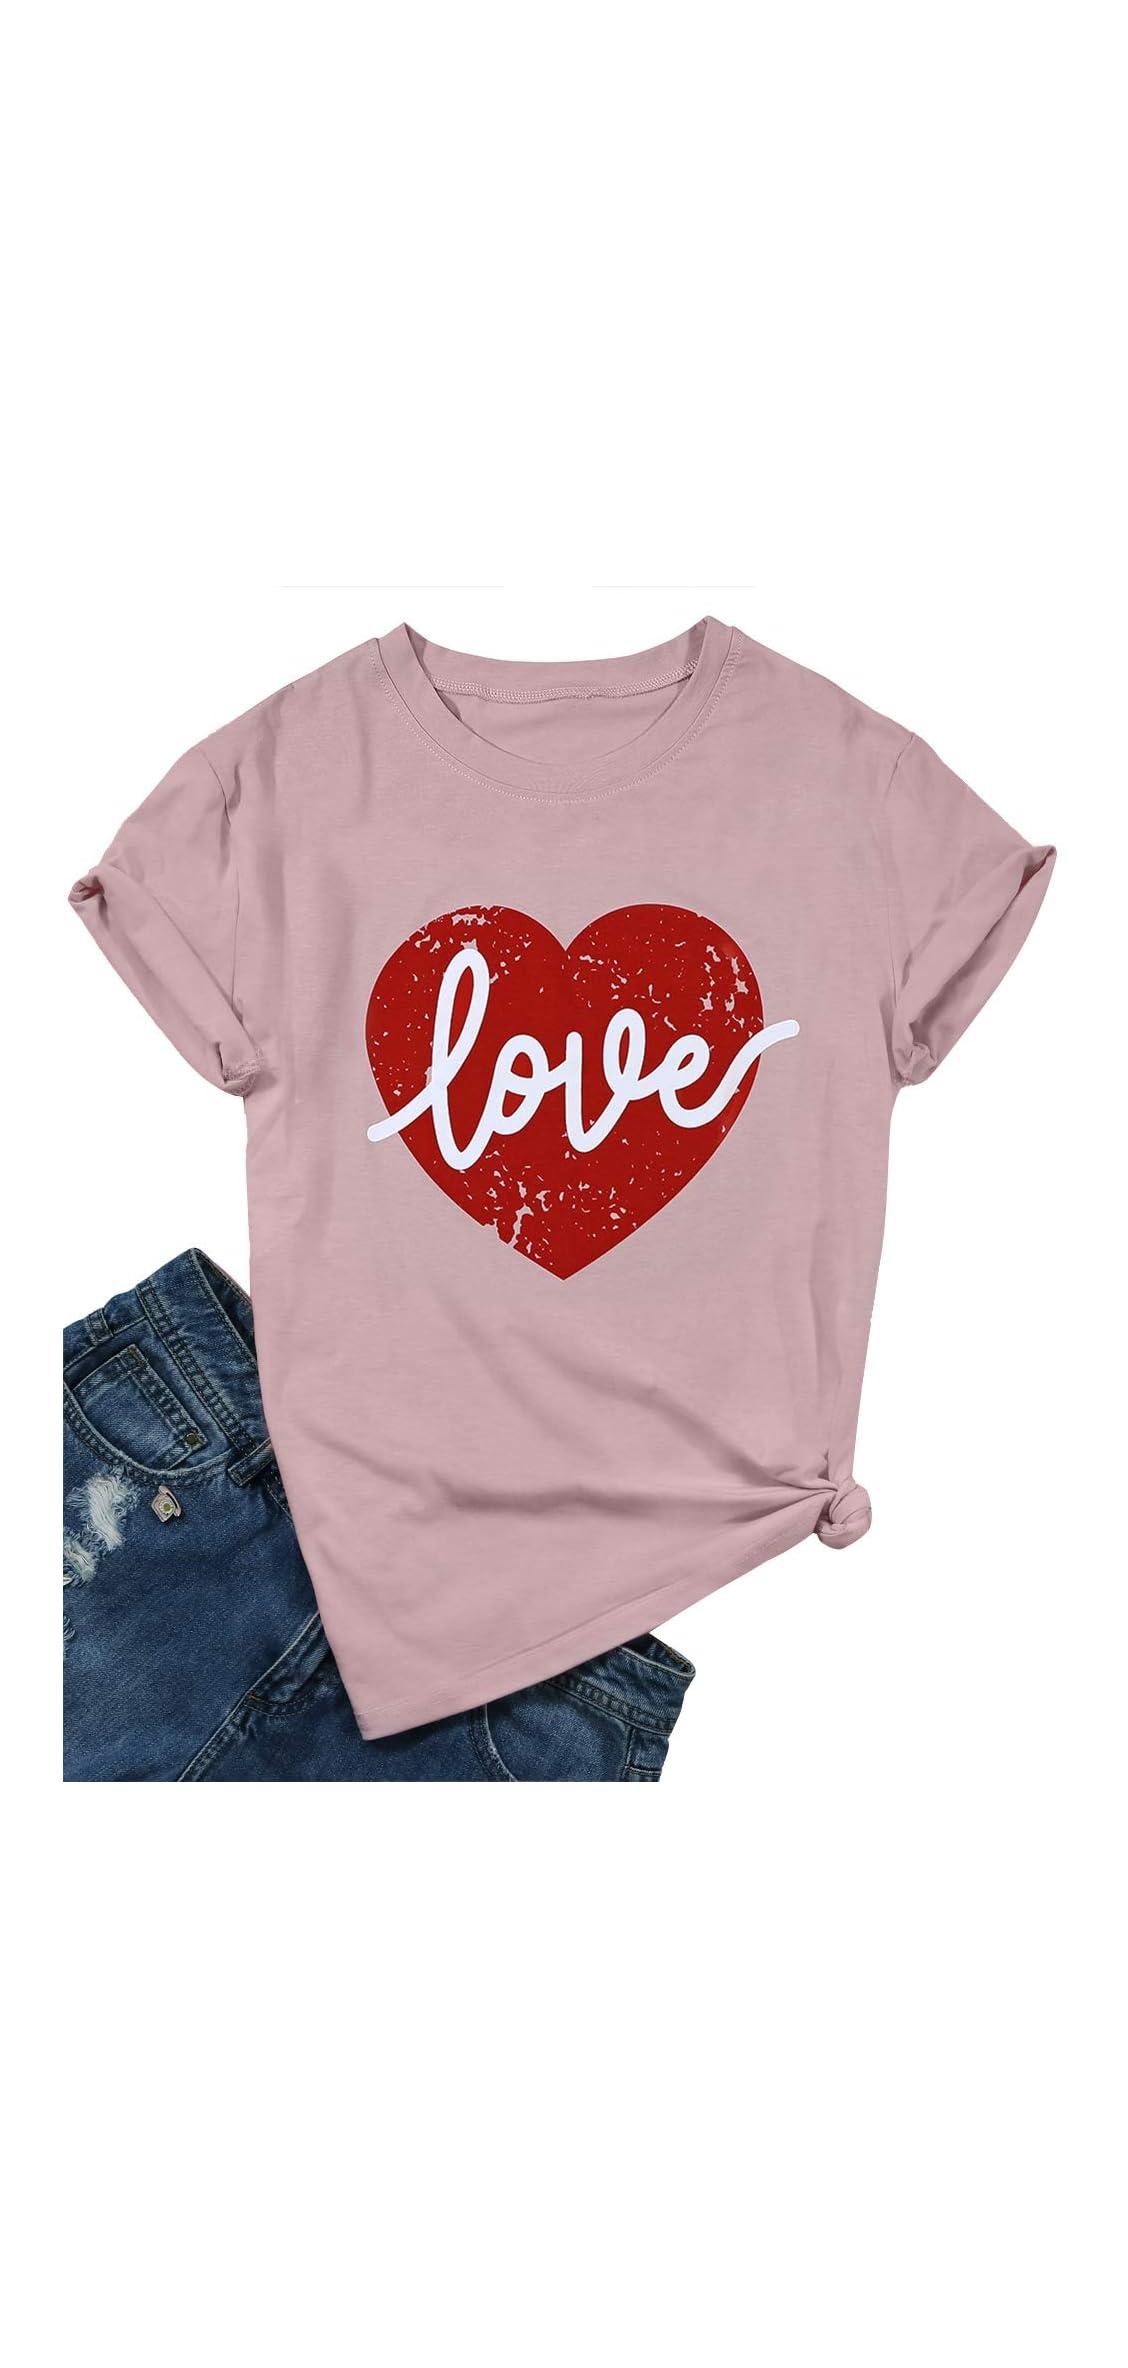 Love Heart Graphic Tee T Shirts For Women Teen Girls Cute T Tee